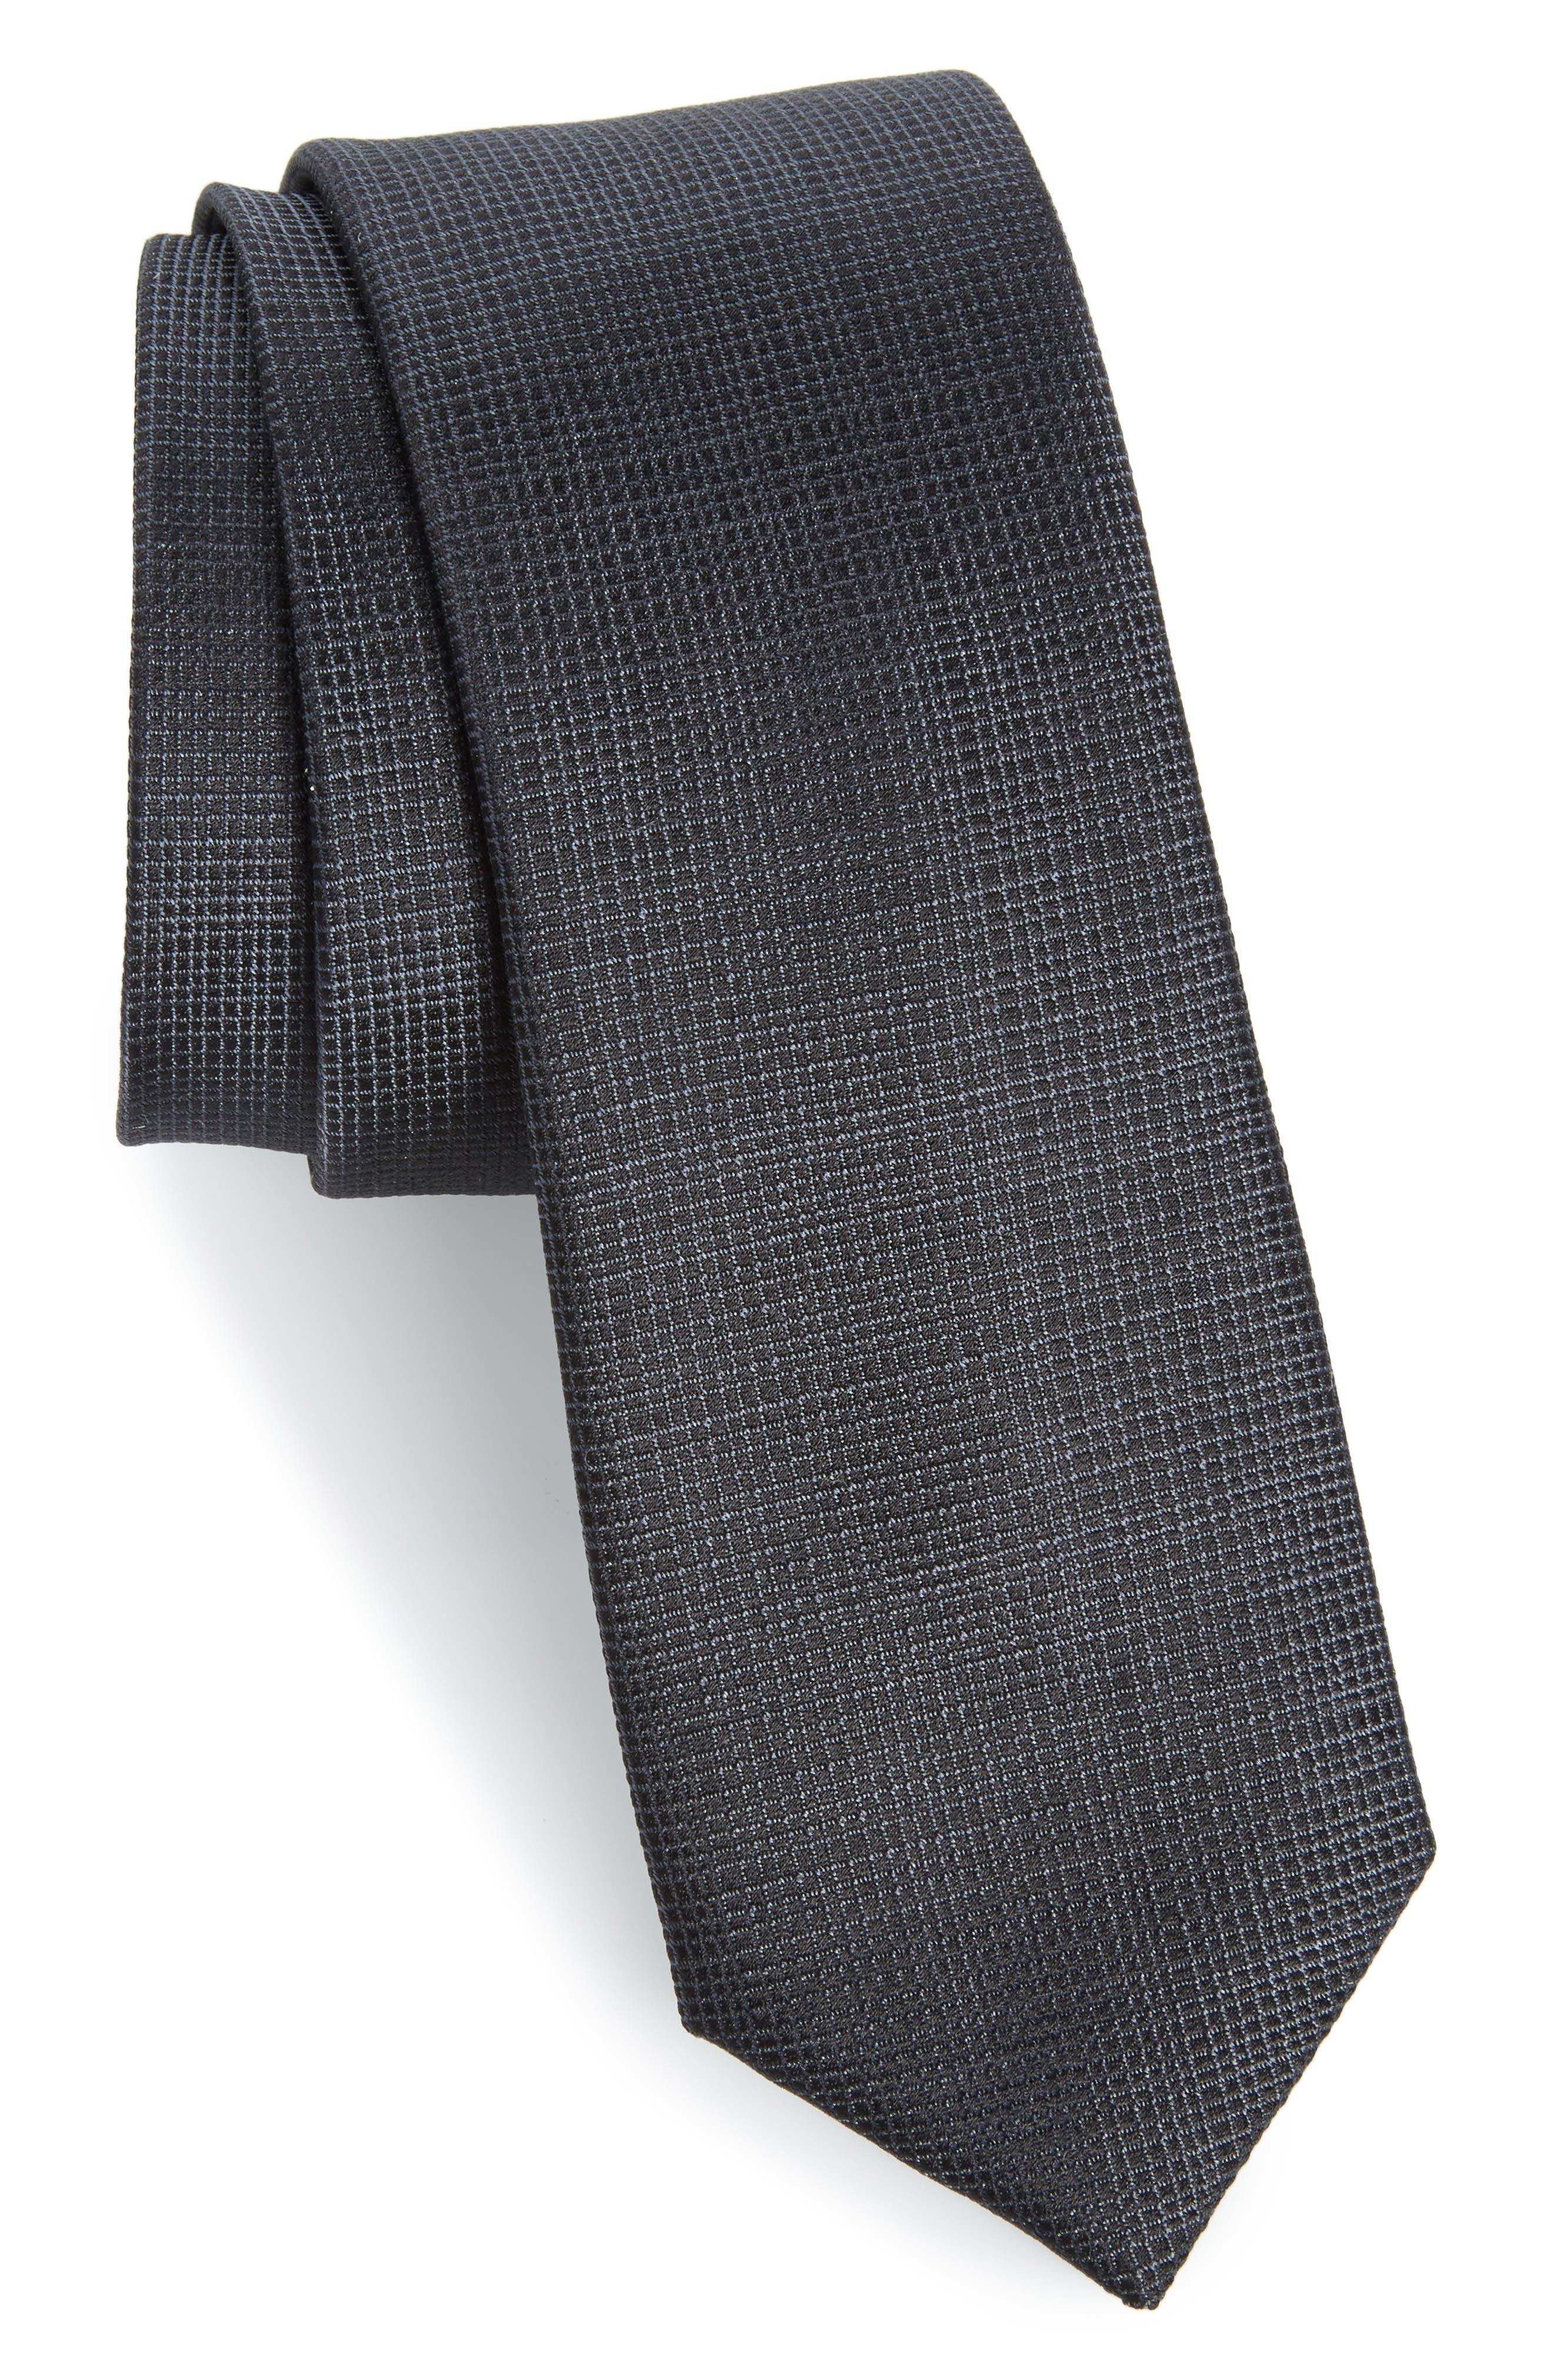 Saffron Solid Silk Skinny Tie,                             Main thumbnail 1, color,                             001